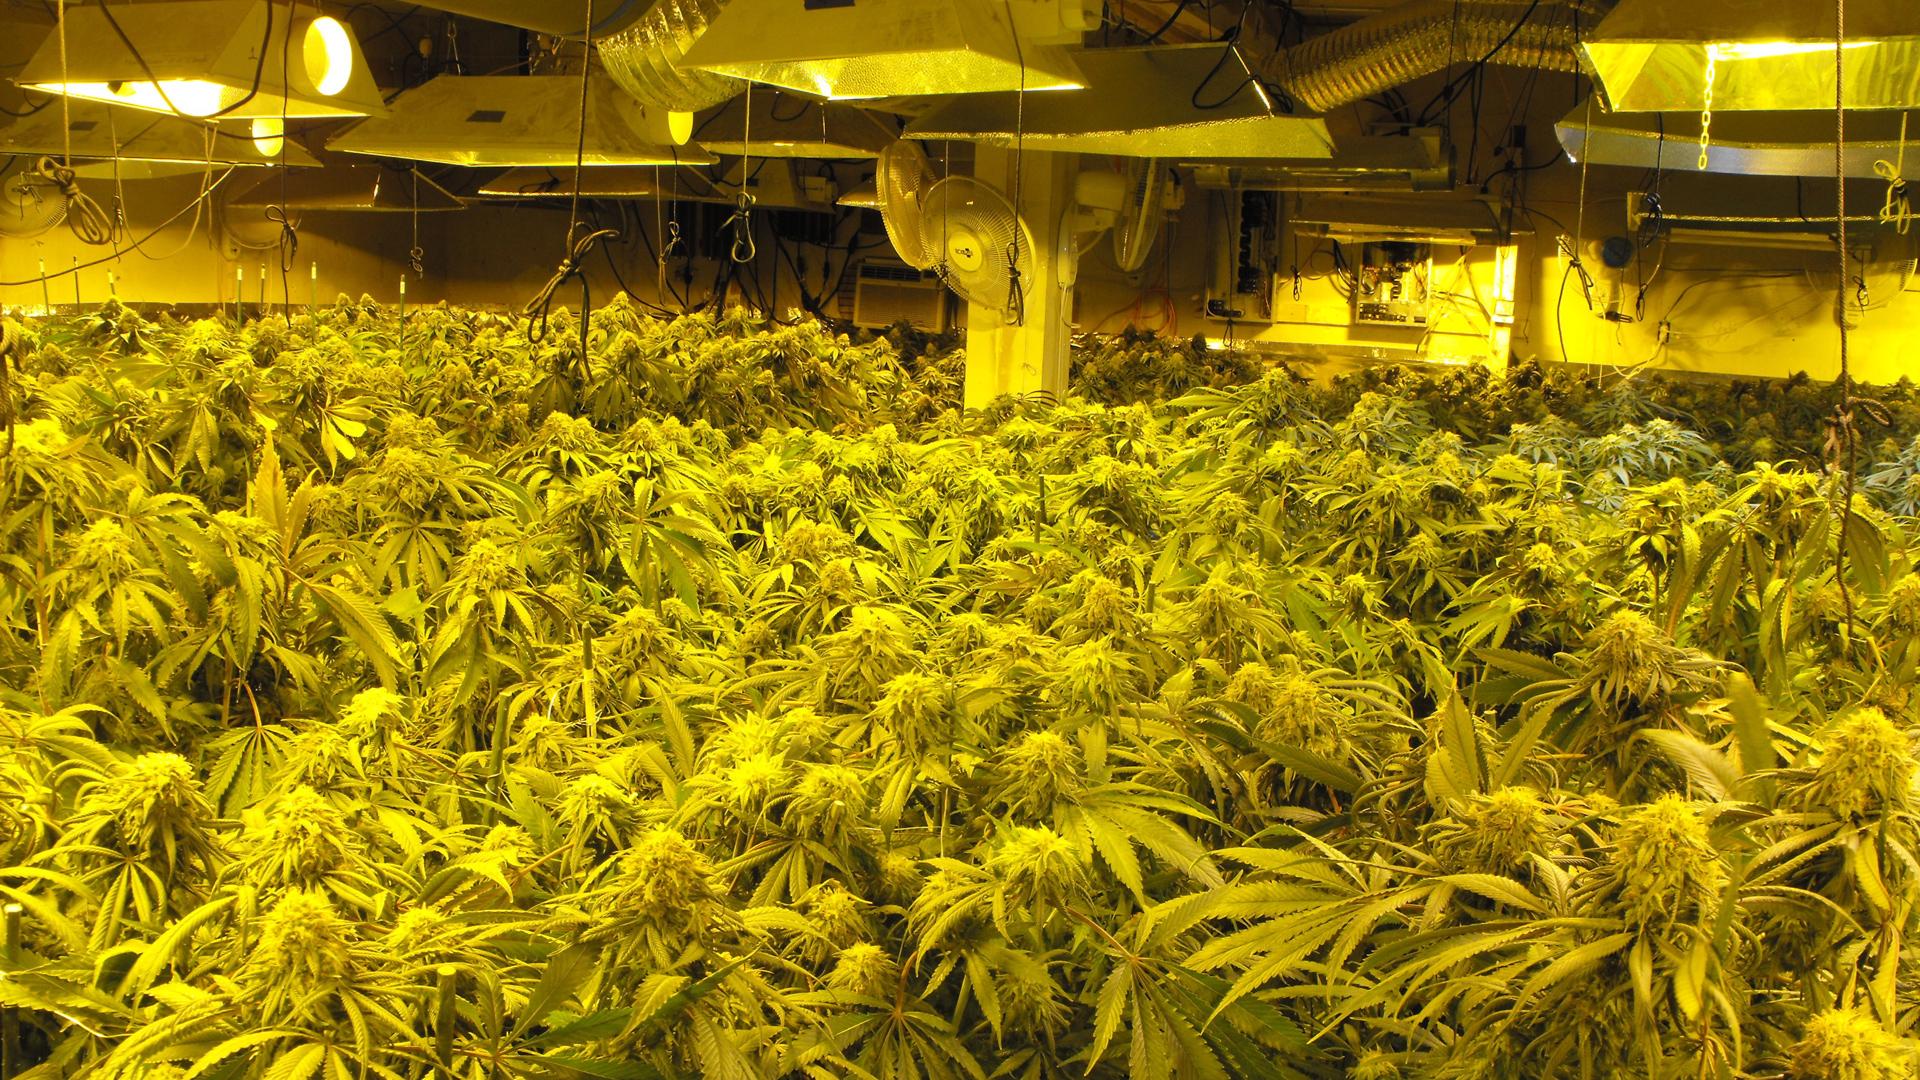 Some of the 1,000 marijuana plants growing inside